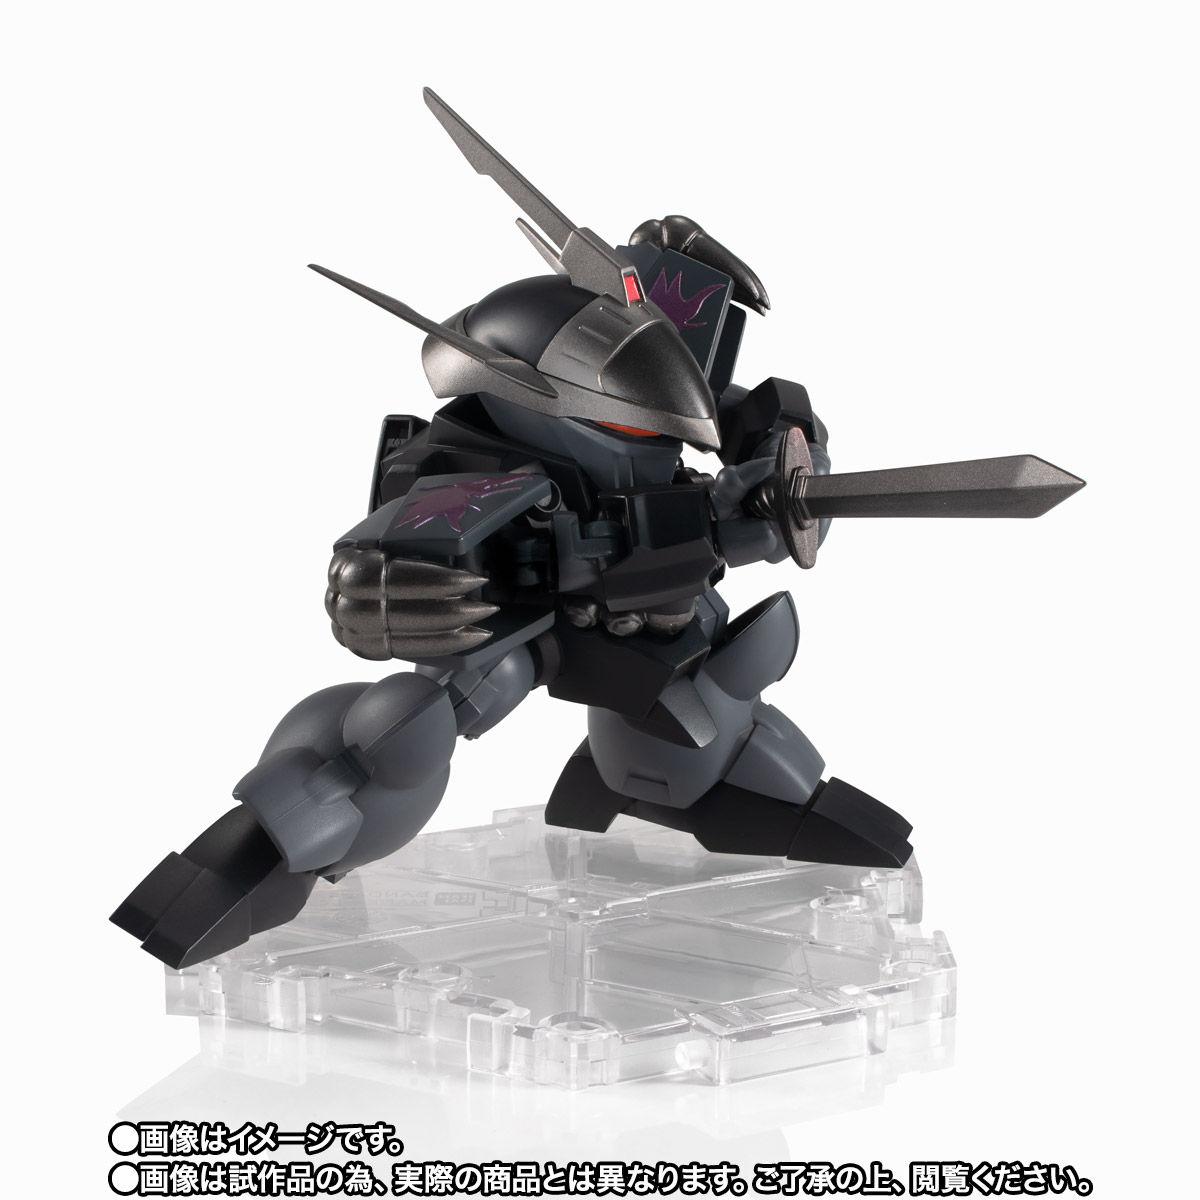 NXEDGE STYLE[MASHIN UNIT]『龍神丸-黒闇-』魔神英雄伝ワタル 可動フィギュア-007